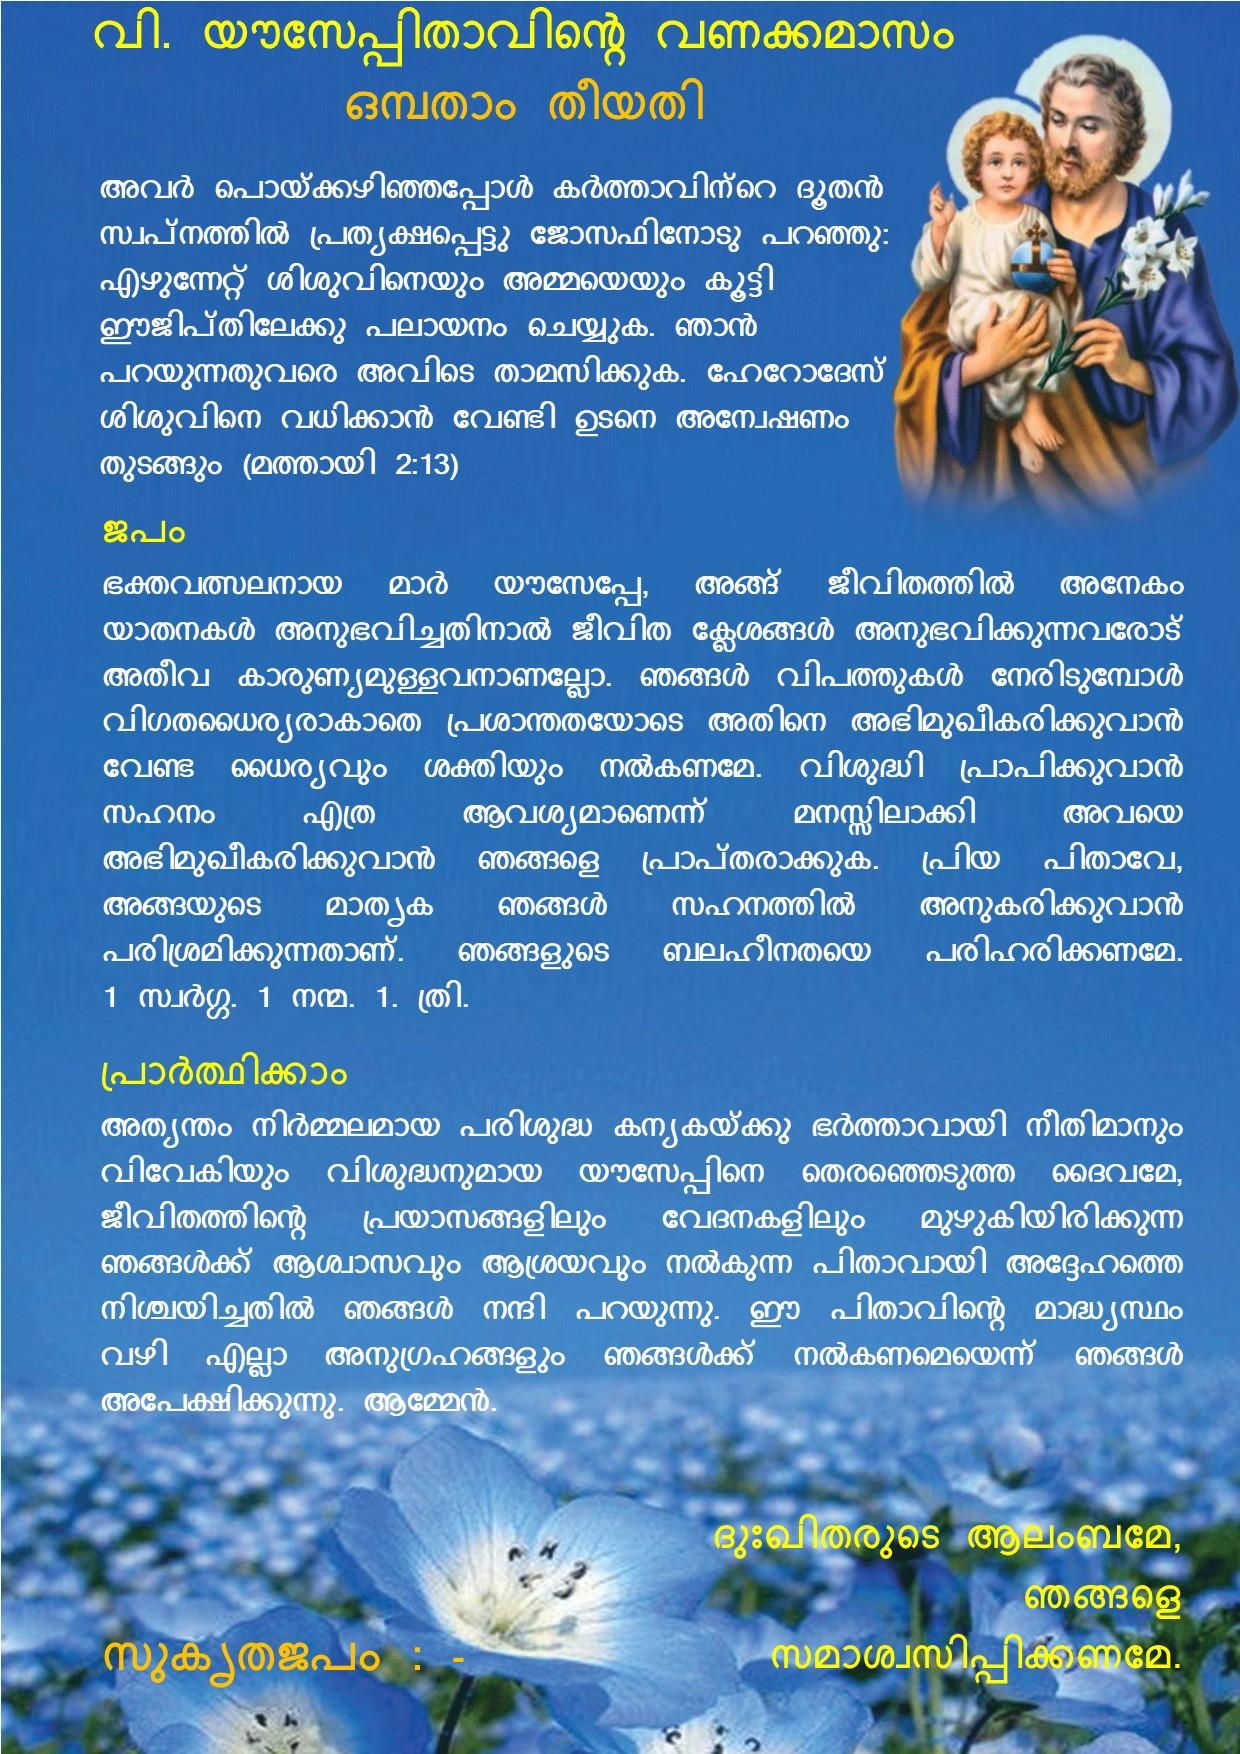 Vanakkamasam, St Joseph, March 09